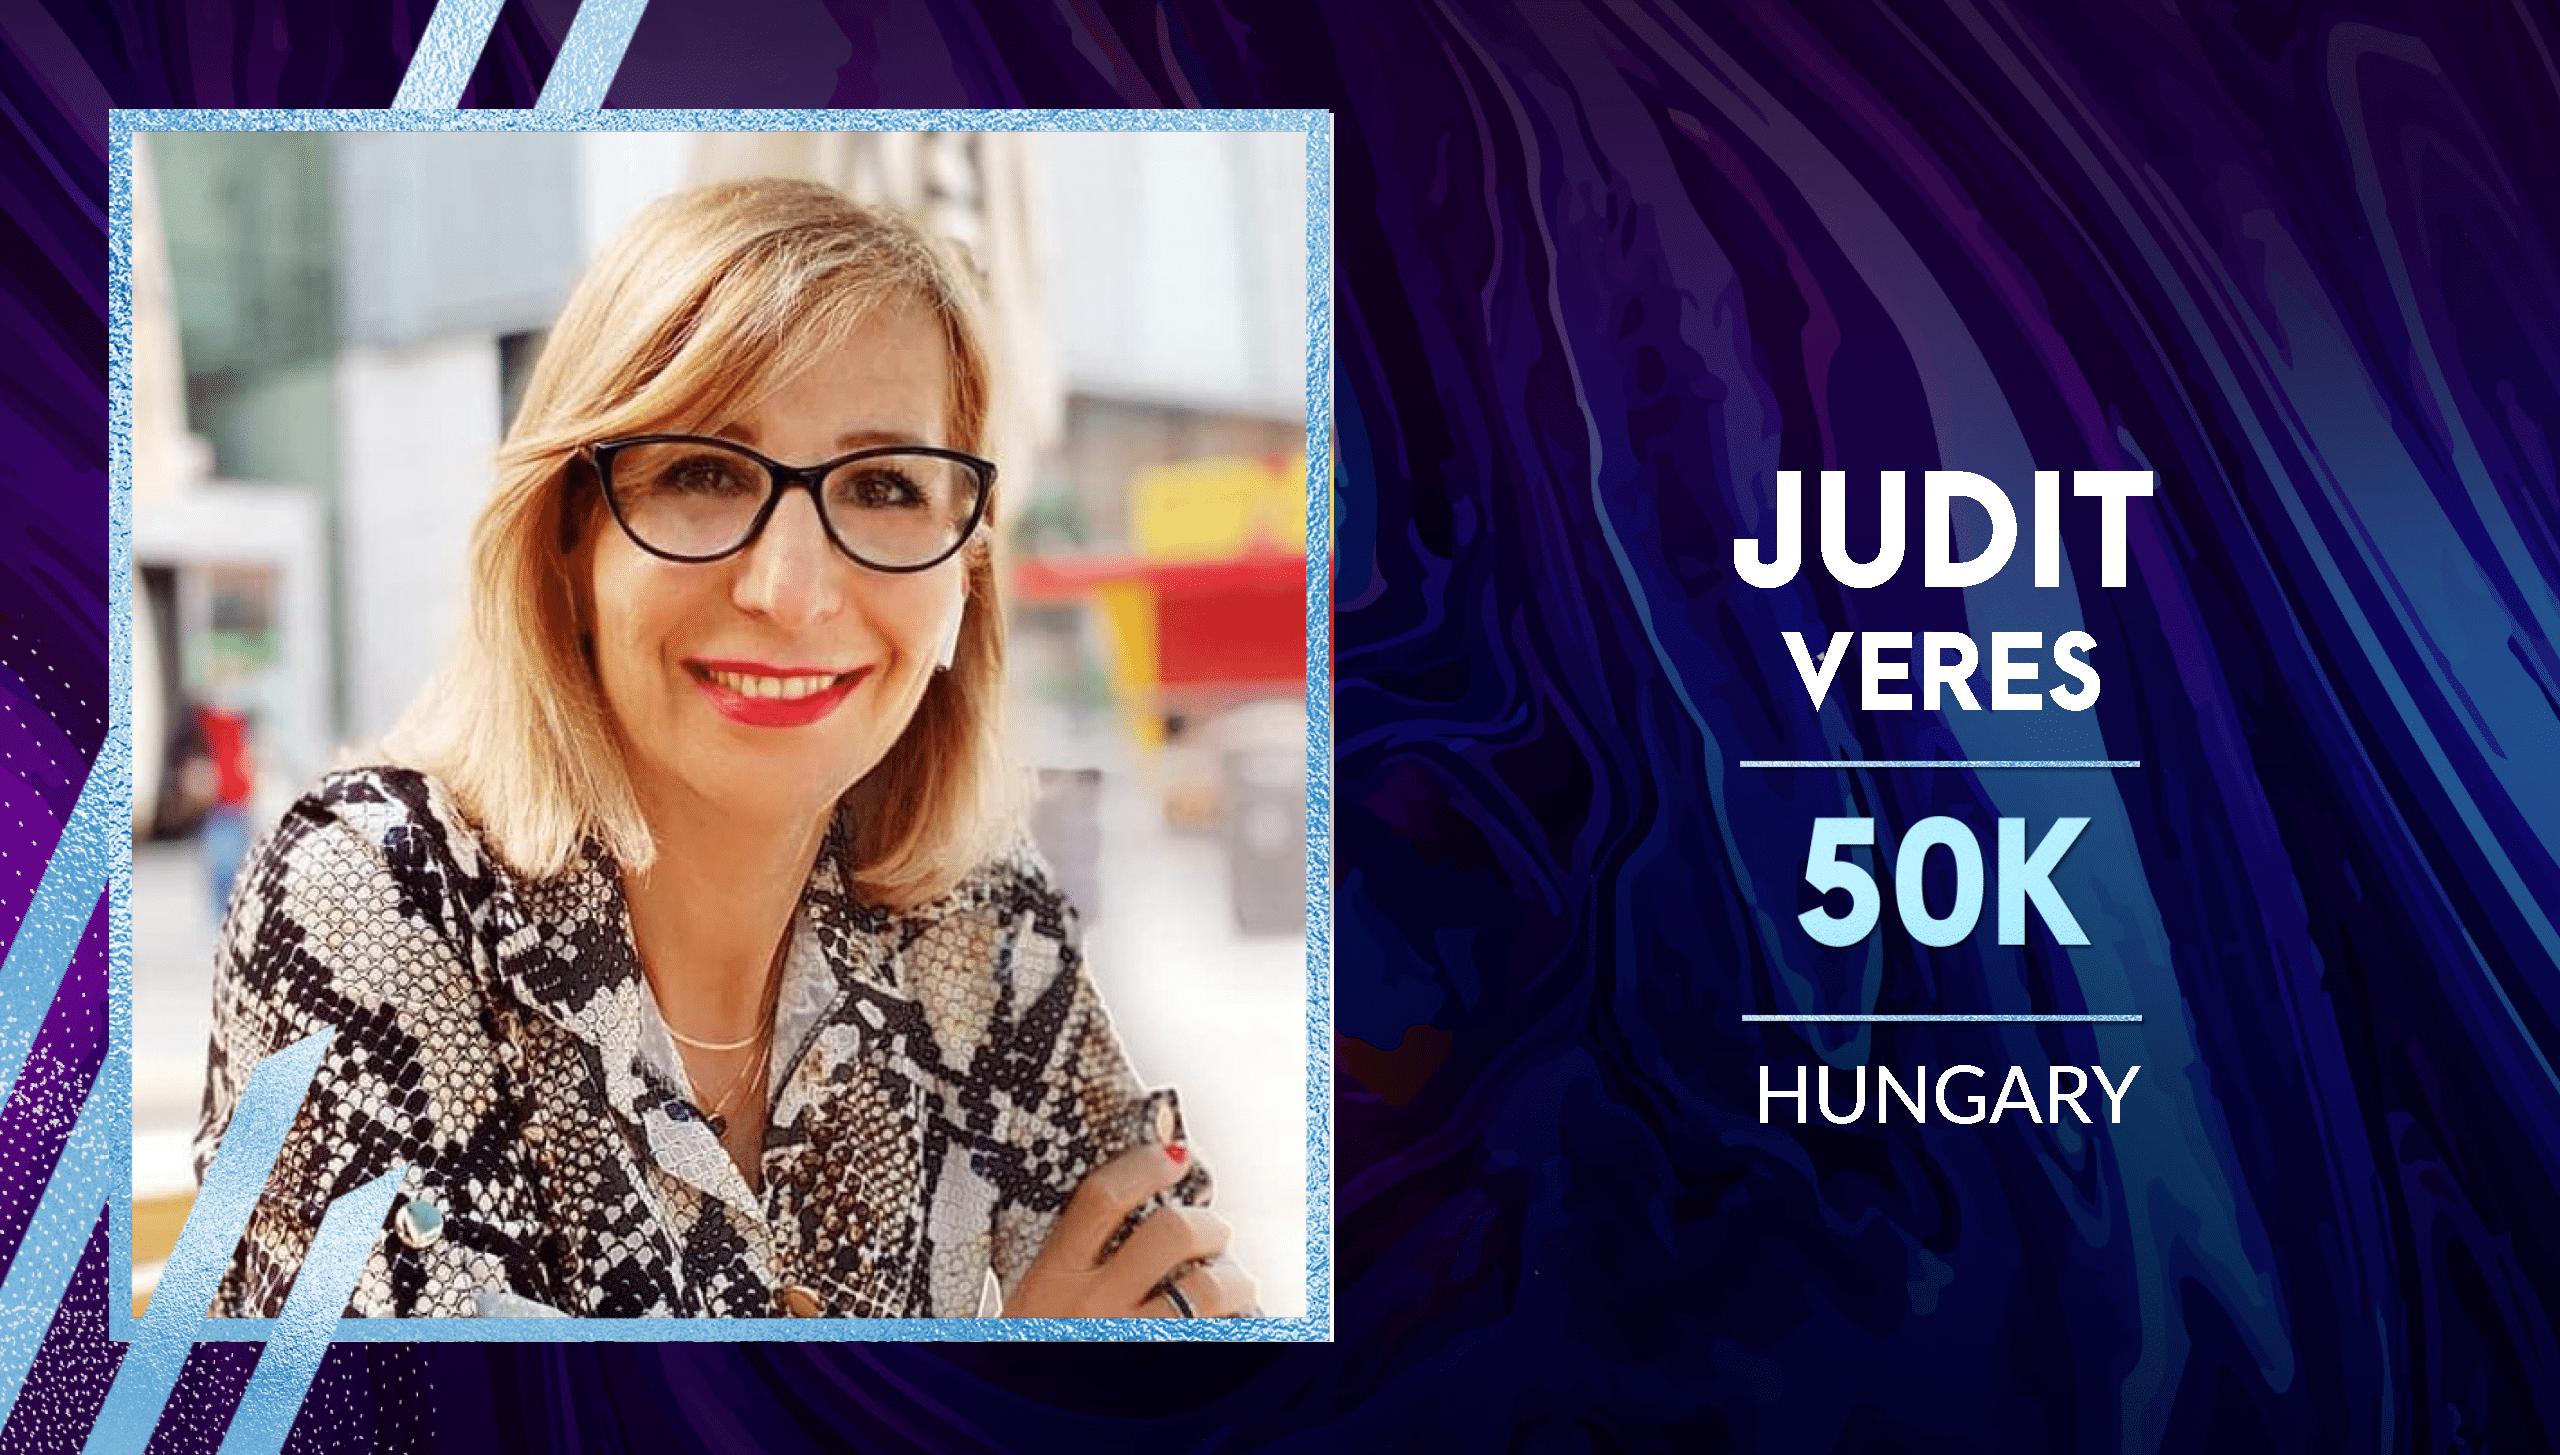 Veres Judit - 50K